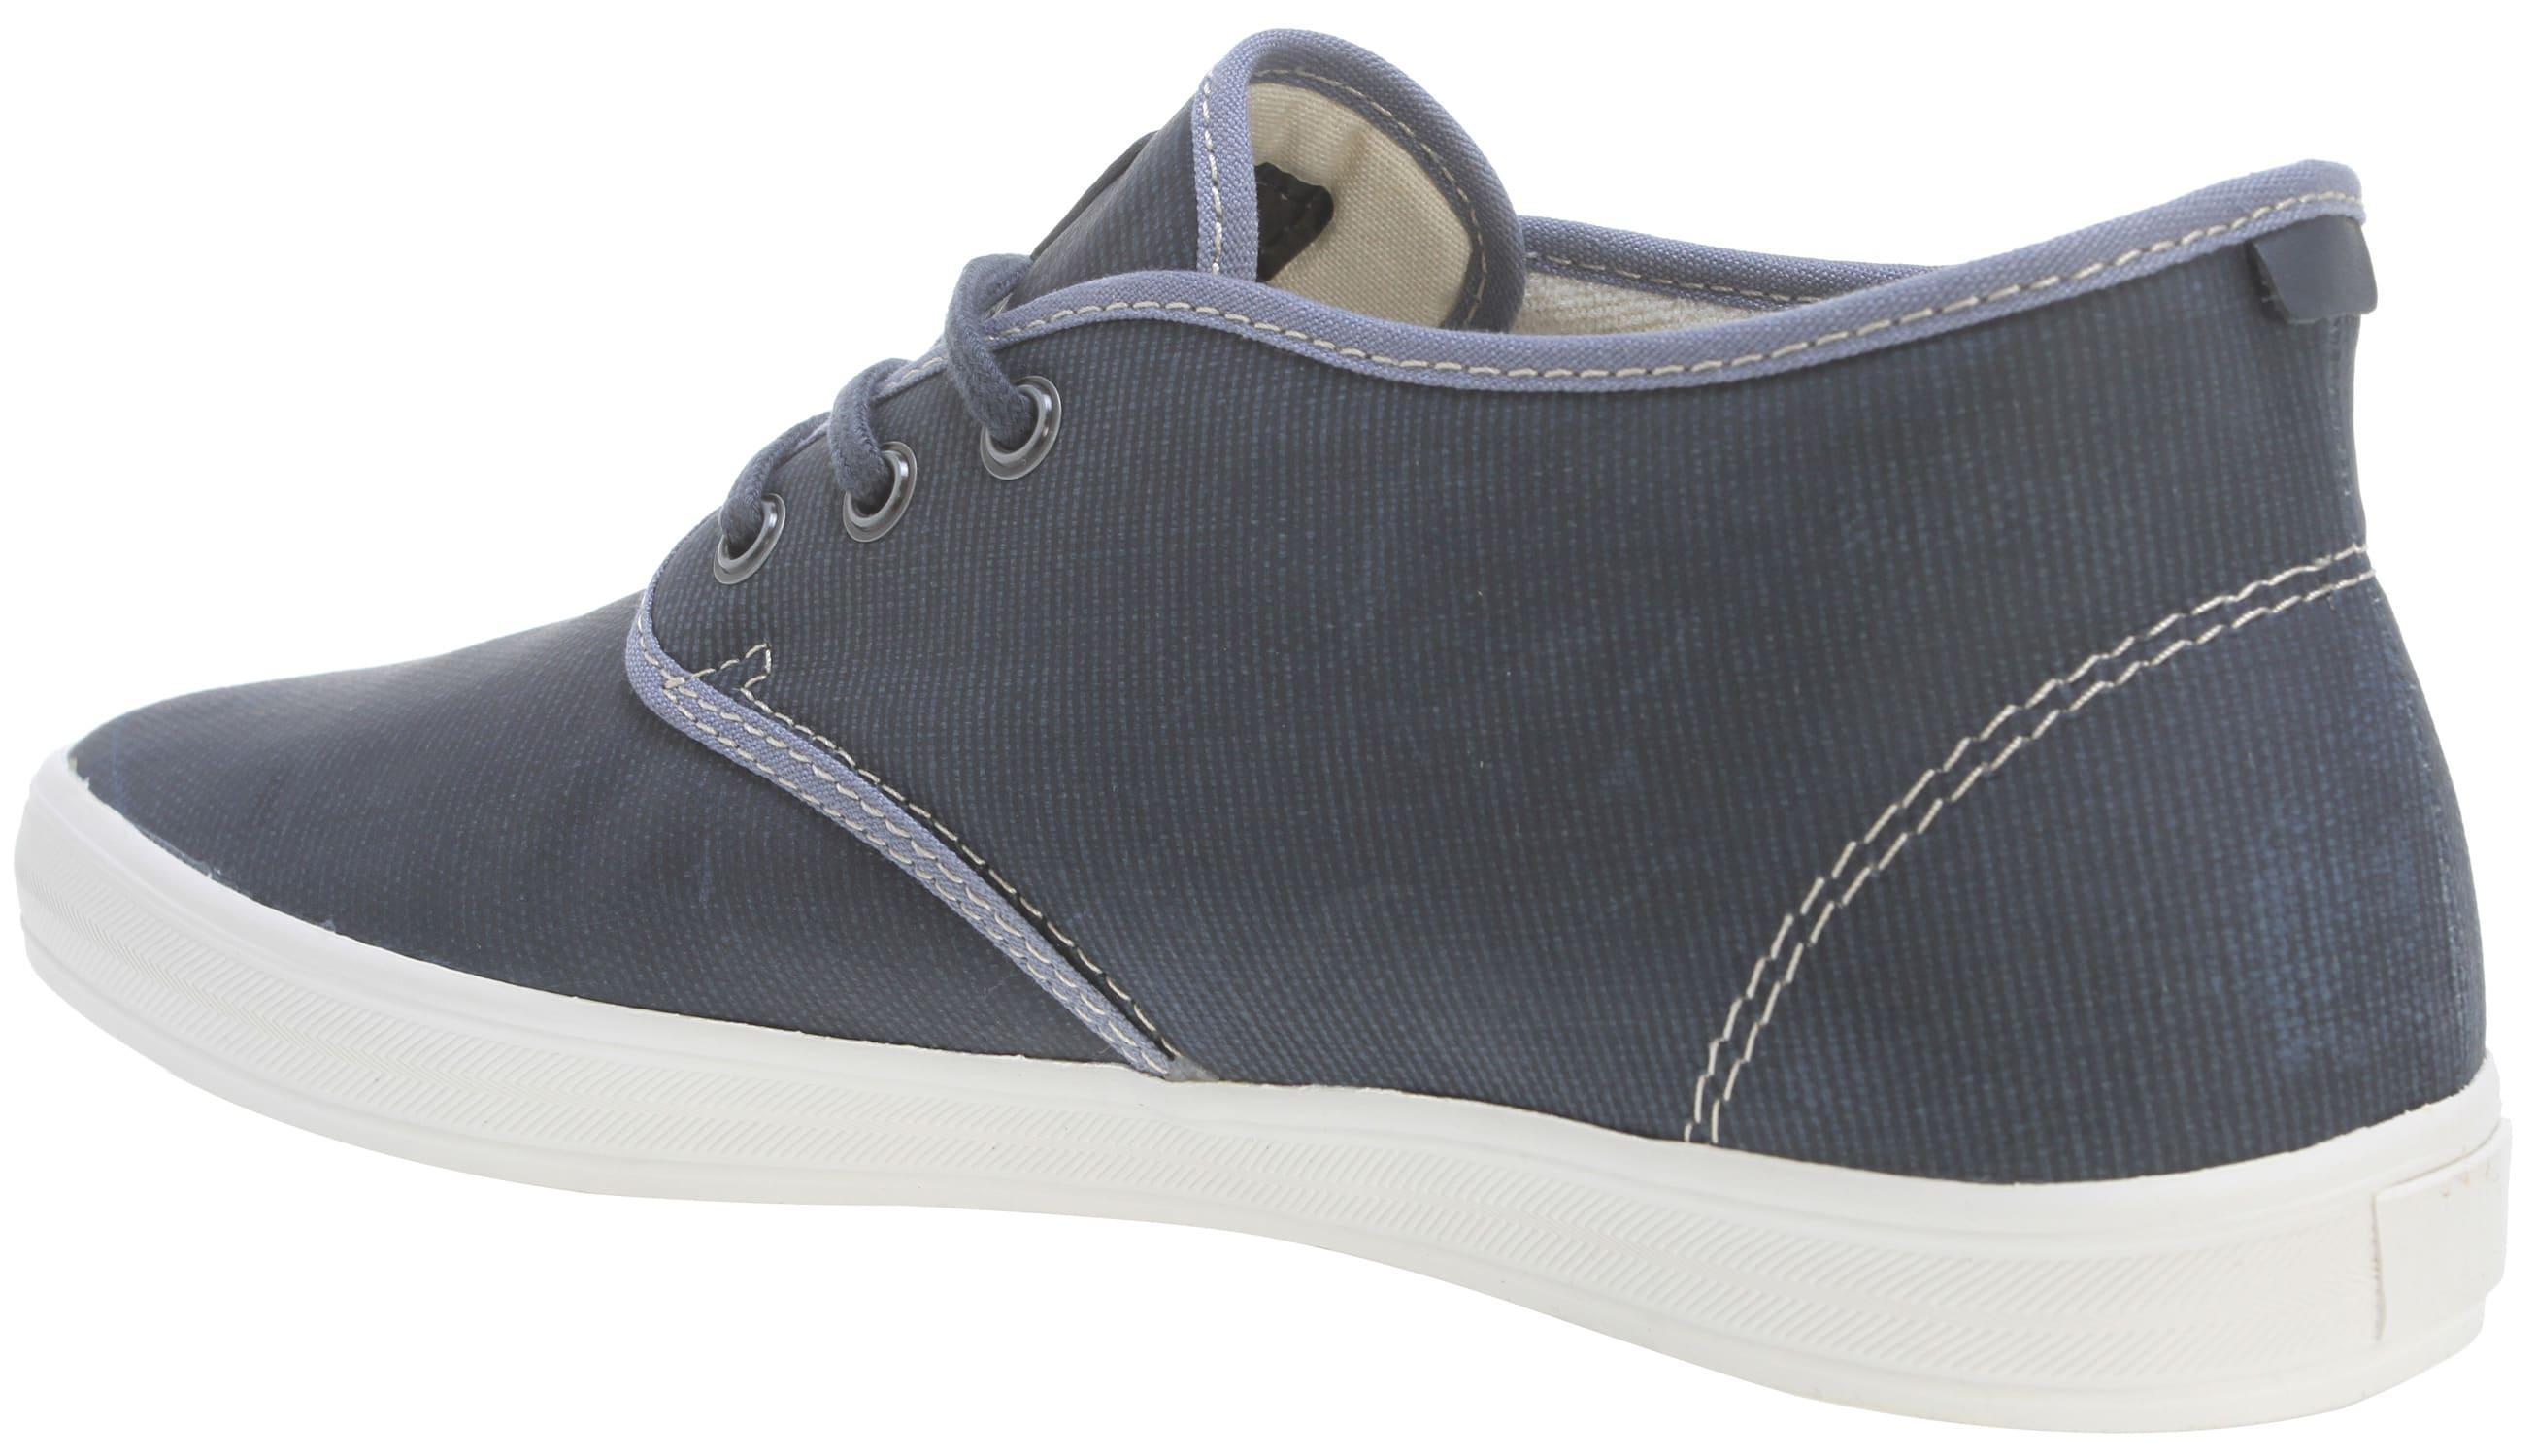 97b2a8dbe70 Gravis Quarters LX Shoes - thumbnail 3